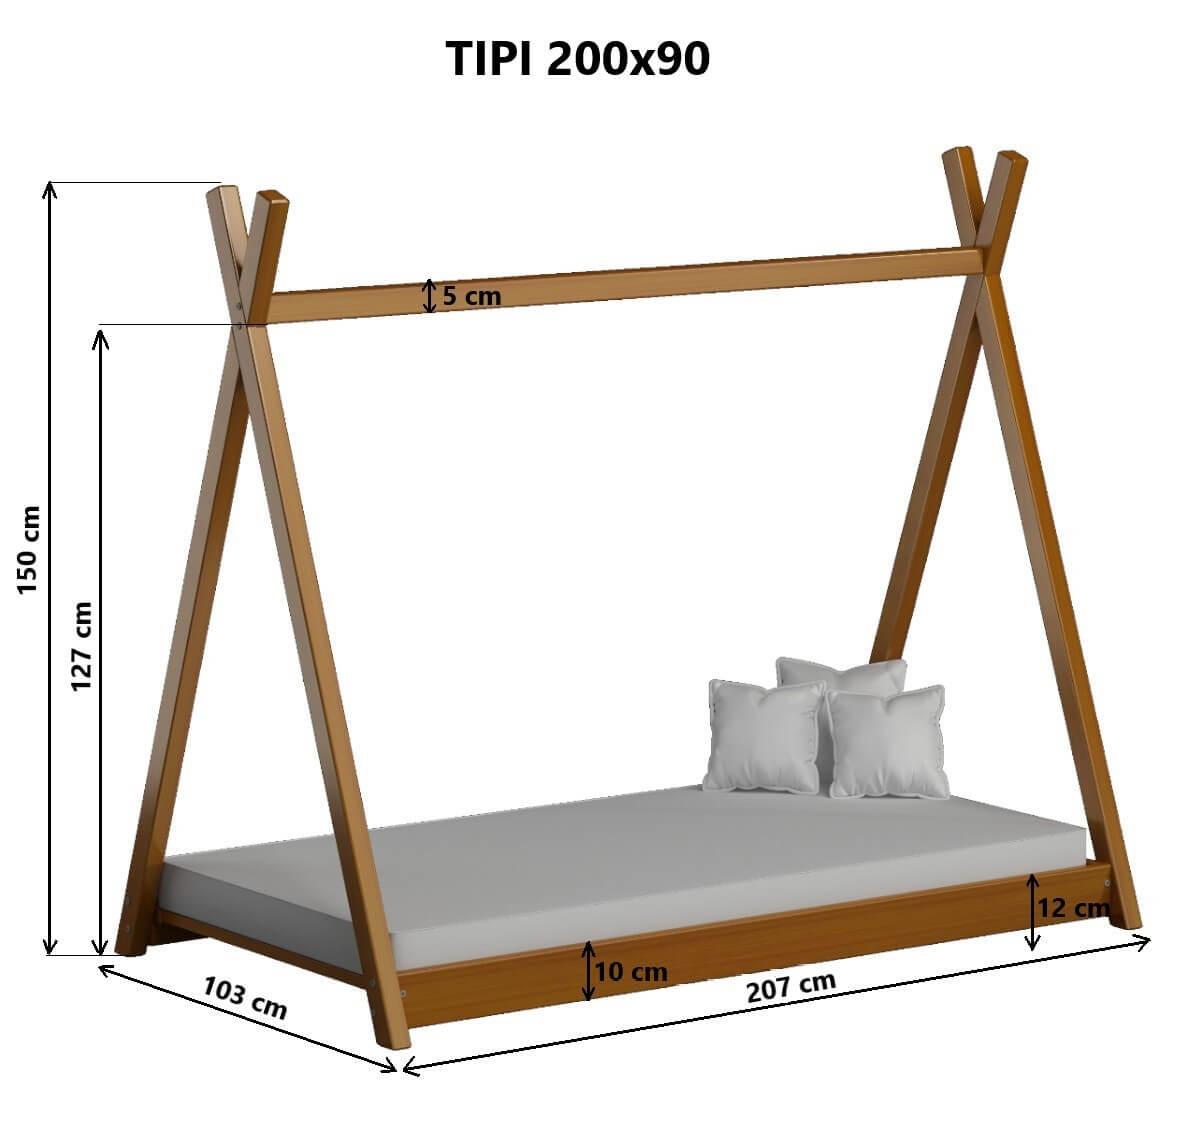 Tipi łóżko